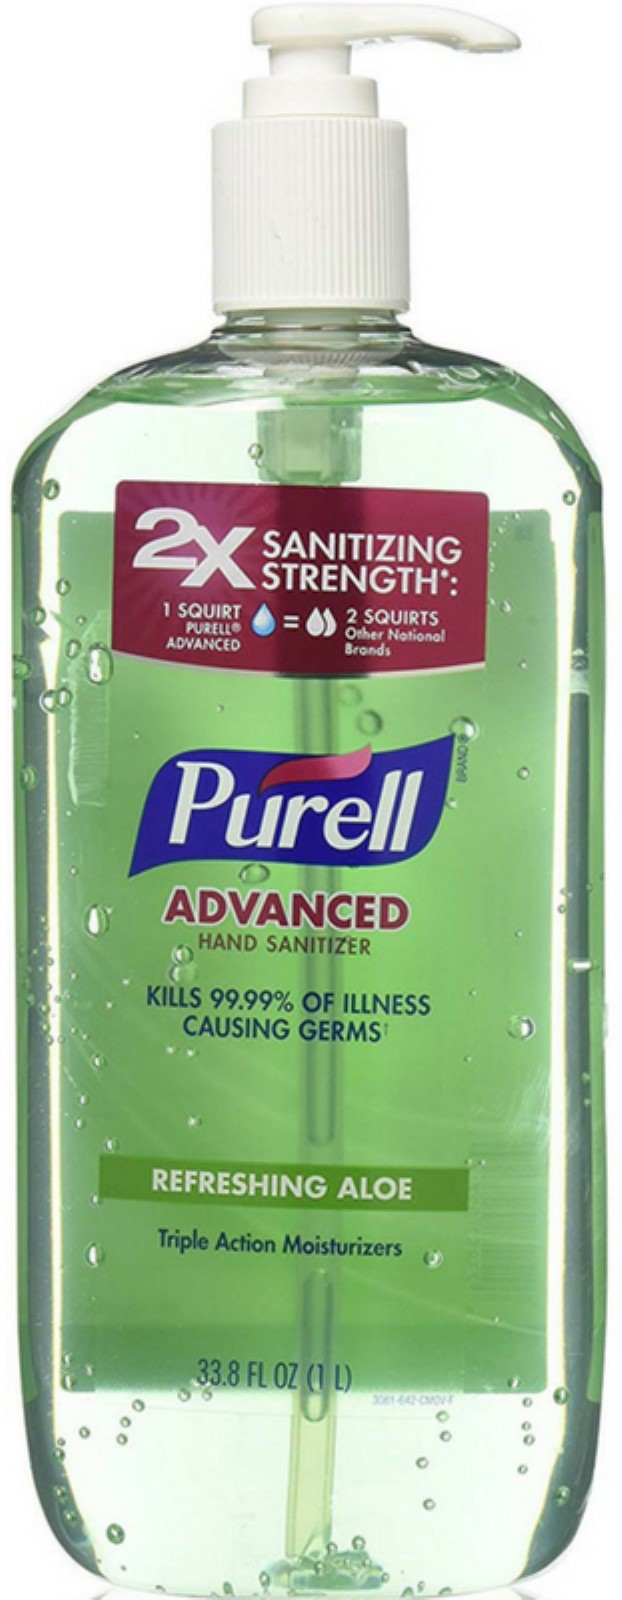 Gojo Purell Hand Sanitizer, 33.8 oz